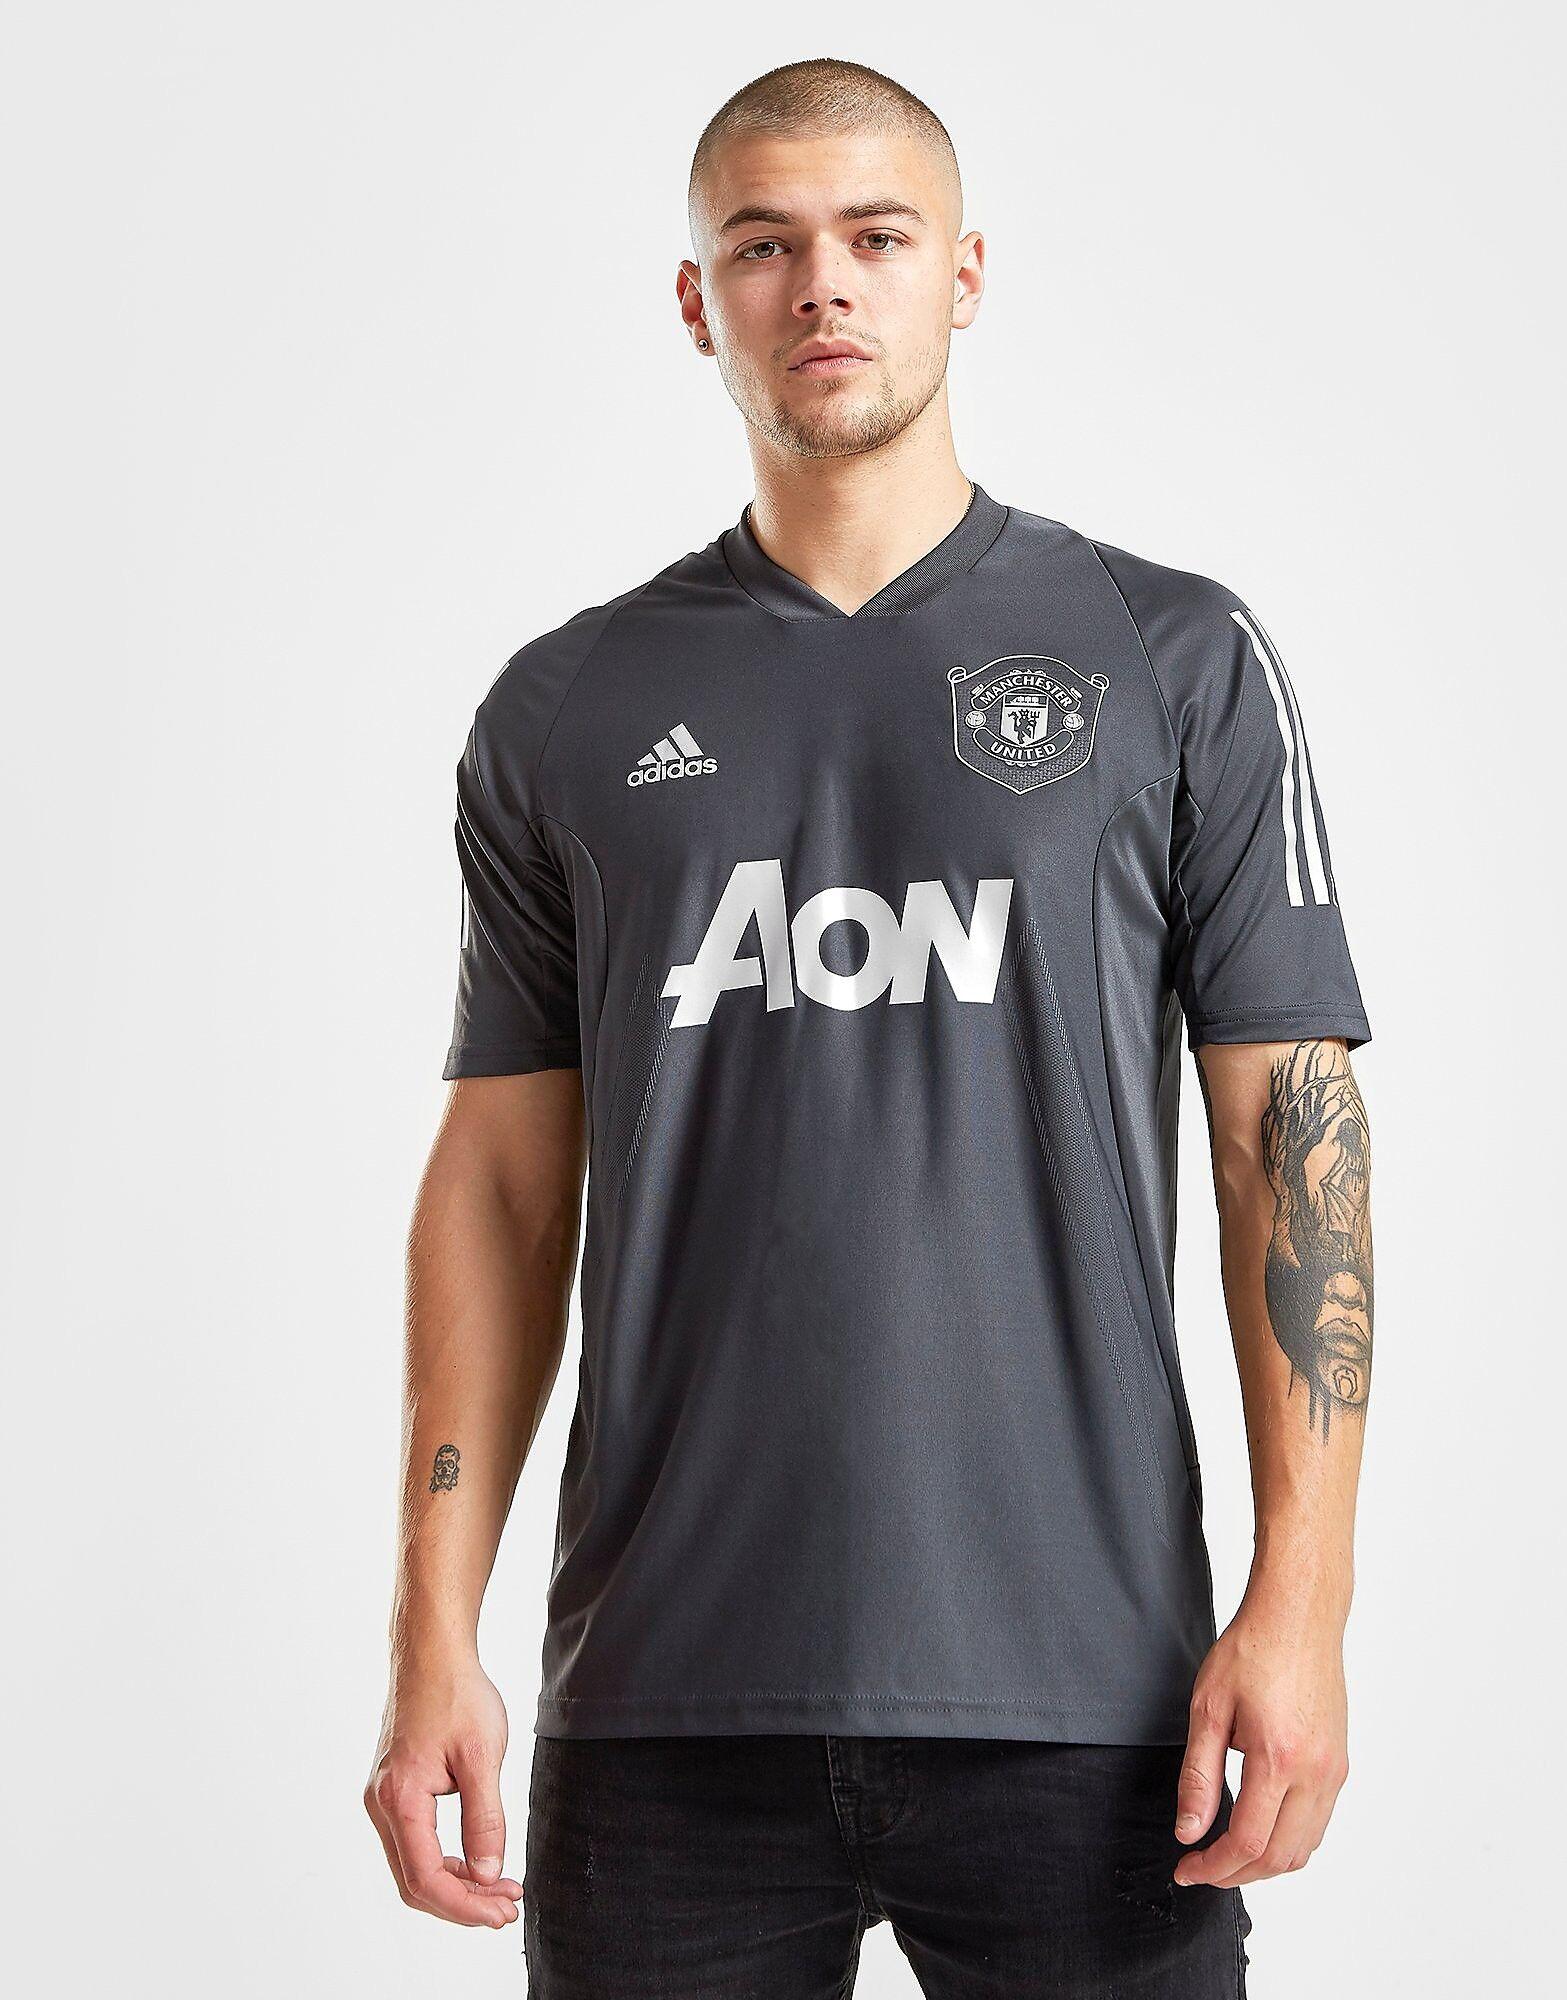 Image of Adidas Manchester United FC Ultimate Treenipaita Miehet - Mens, Harmaa